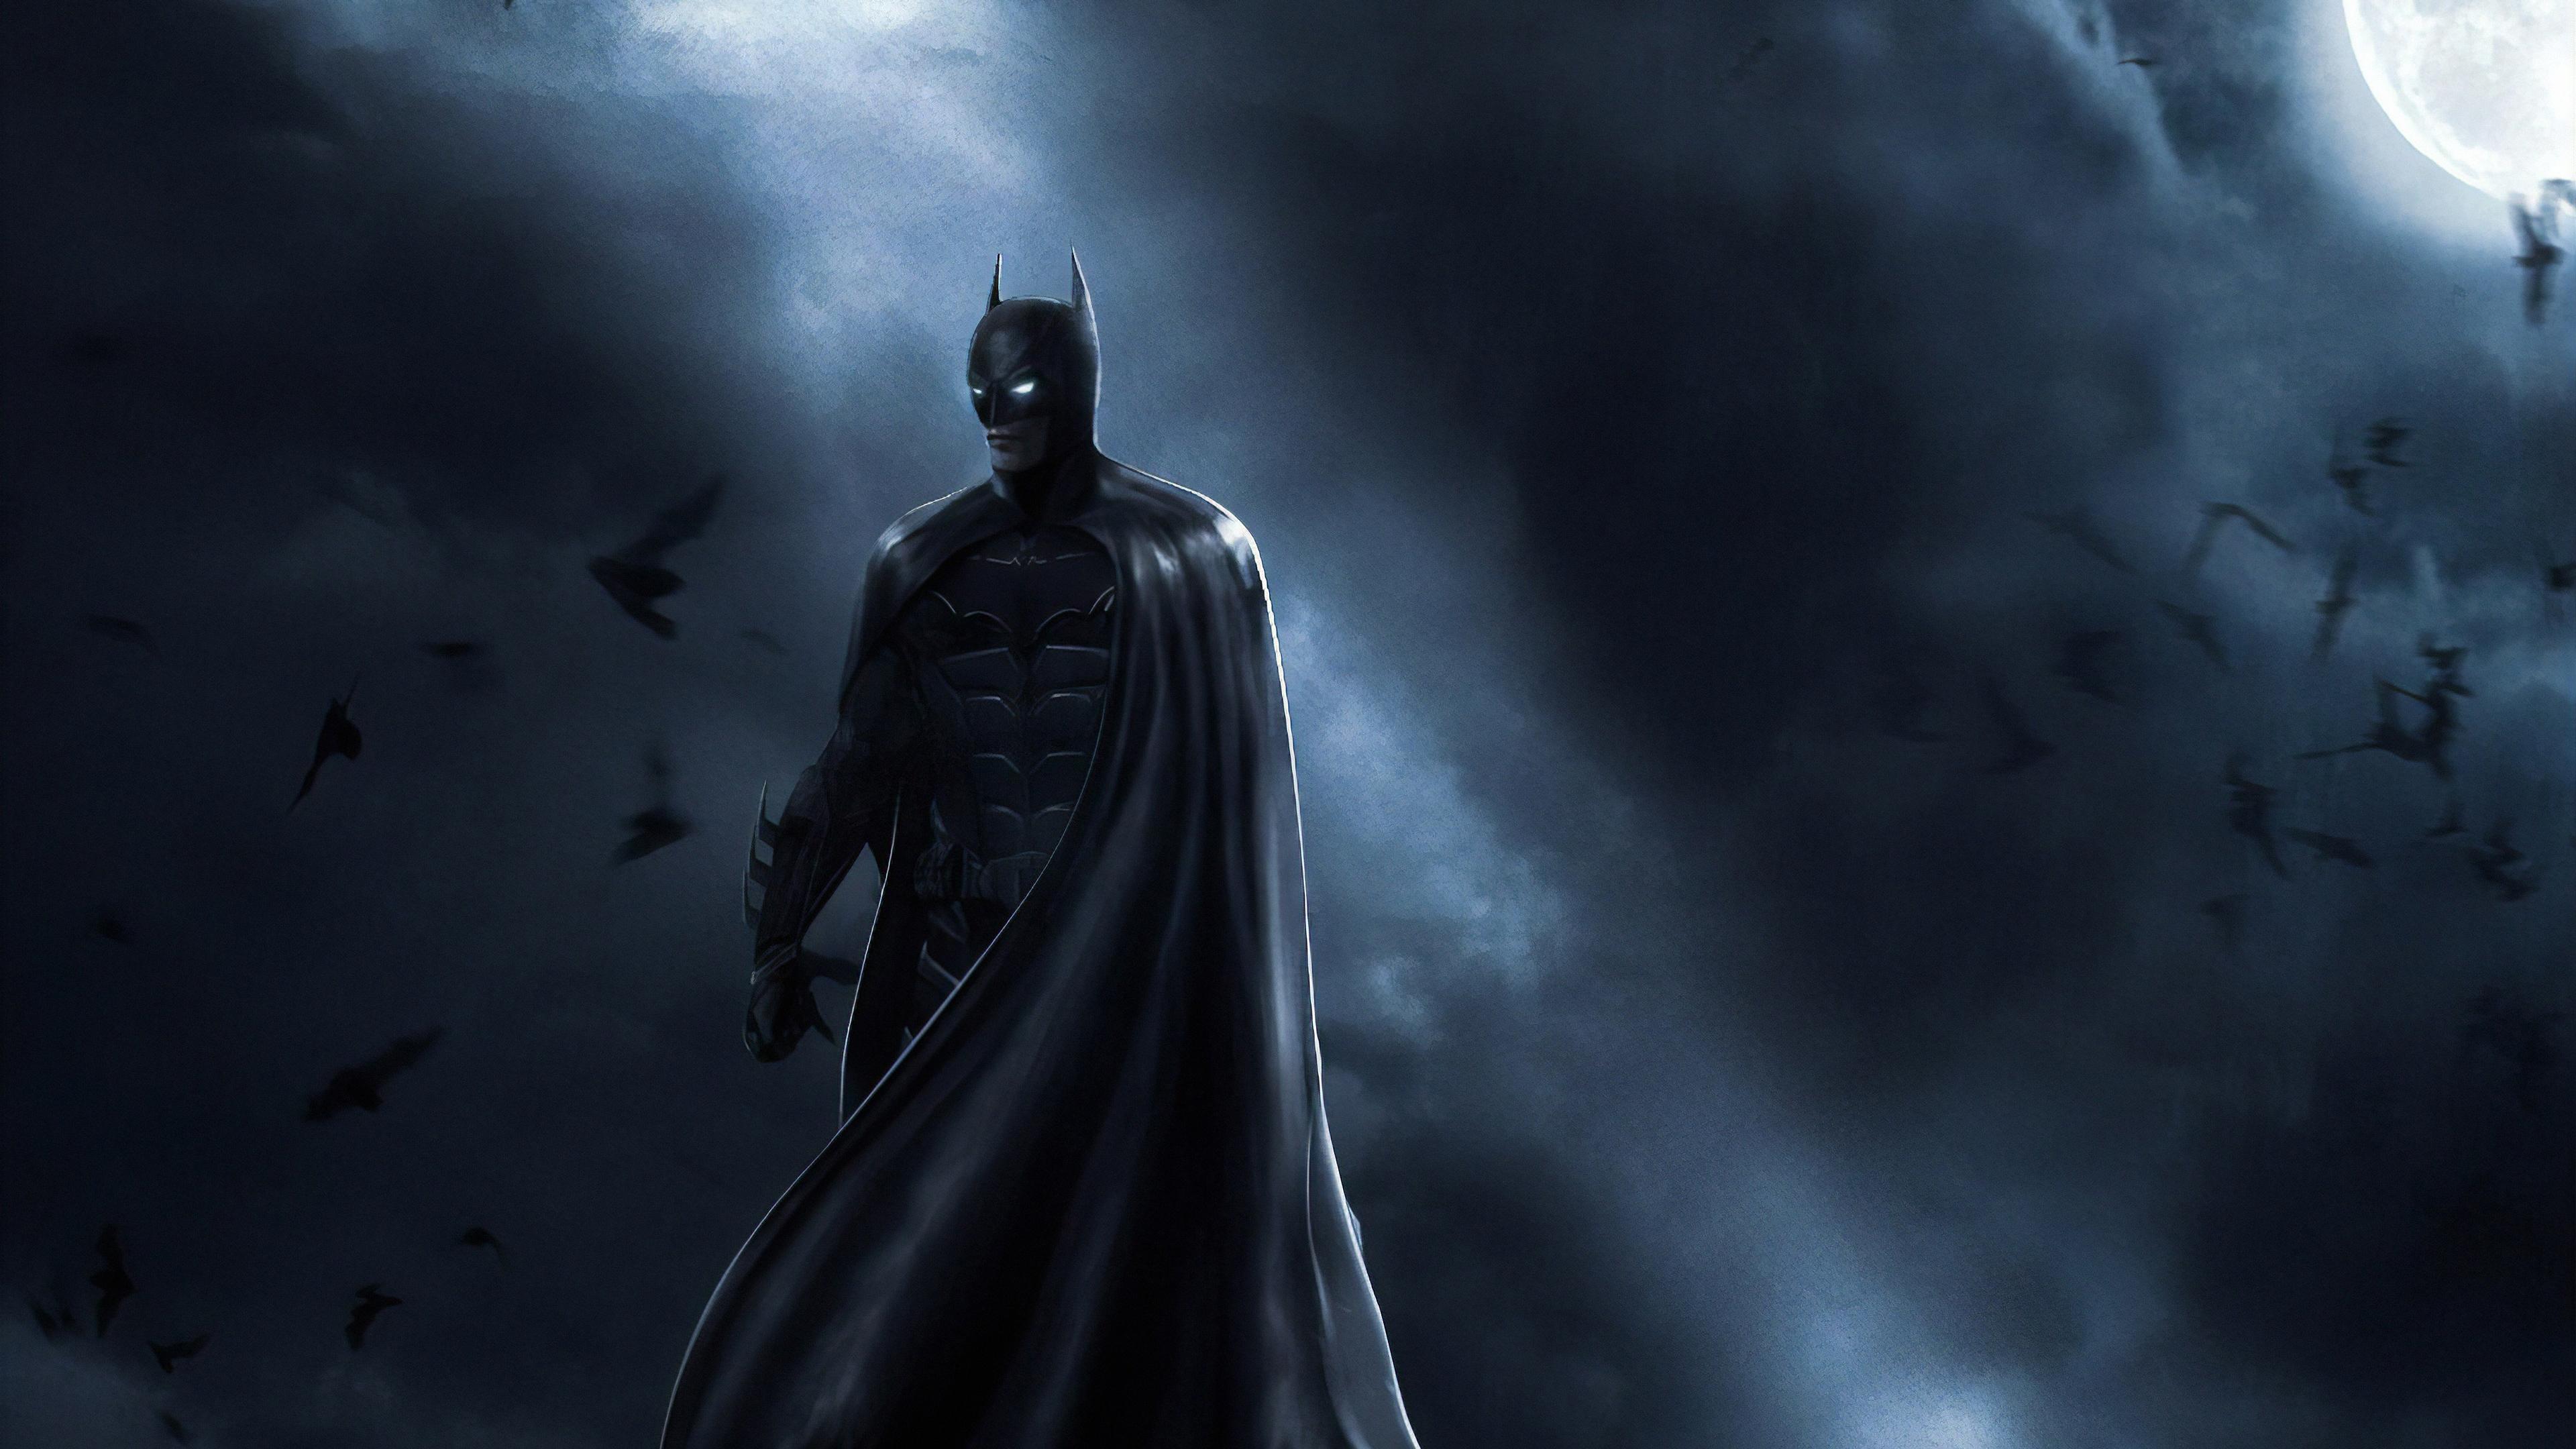 batman darknight hero 1570394678 - Batman Darknight Hero - superheroes wallpapers, portrait wallpapers, hd-wallpapers, batman wallpapers, artwork wallpapers, 4k-wallpapers